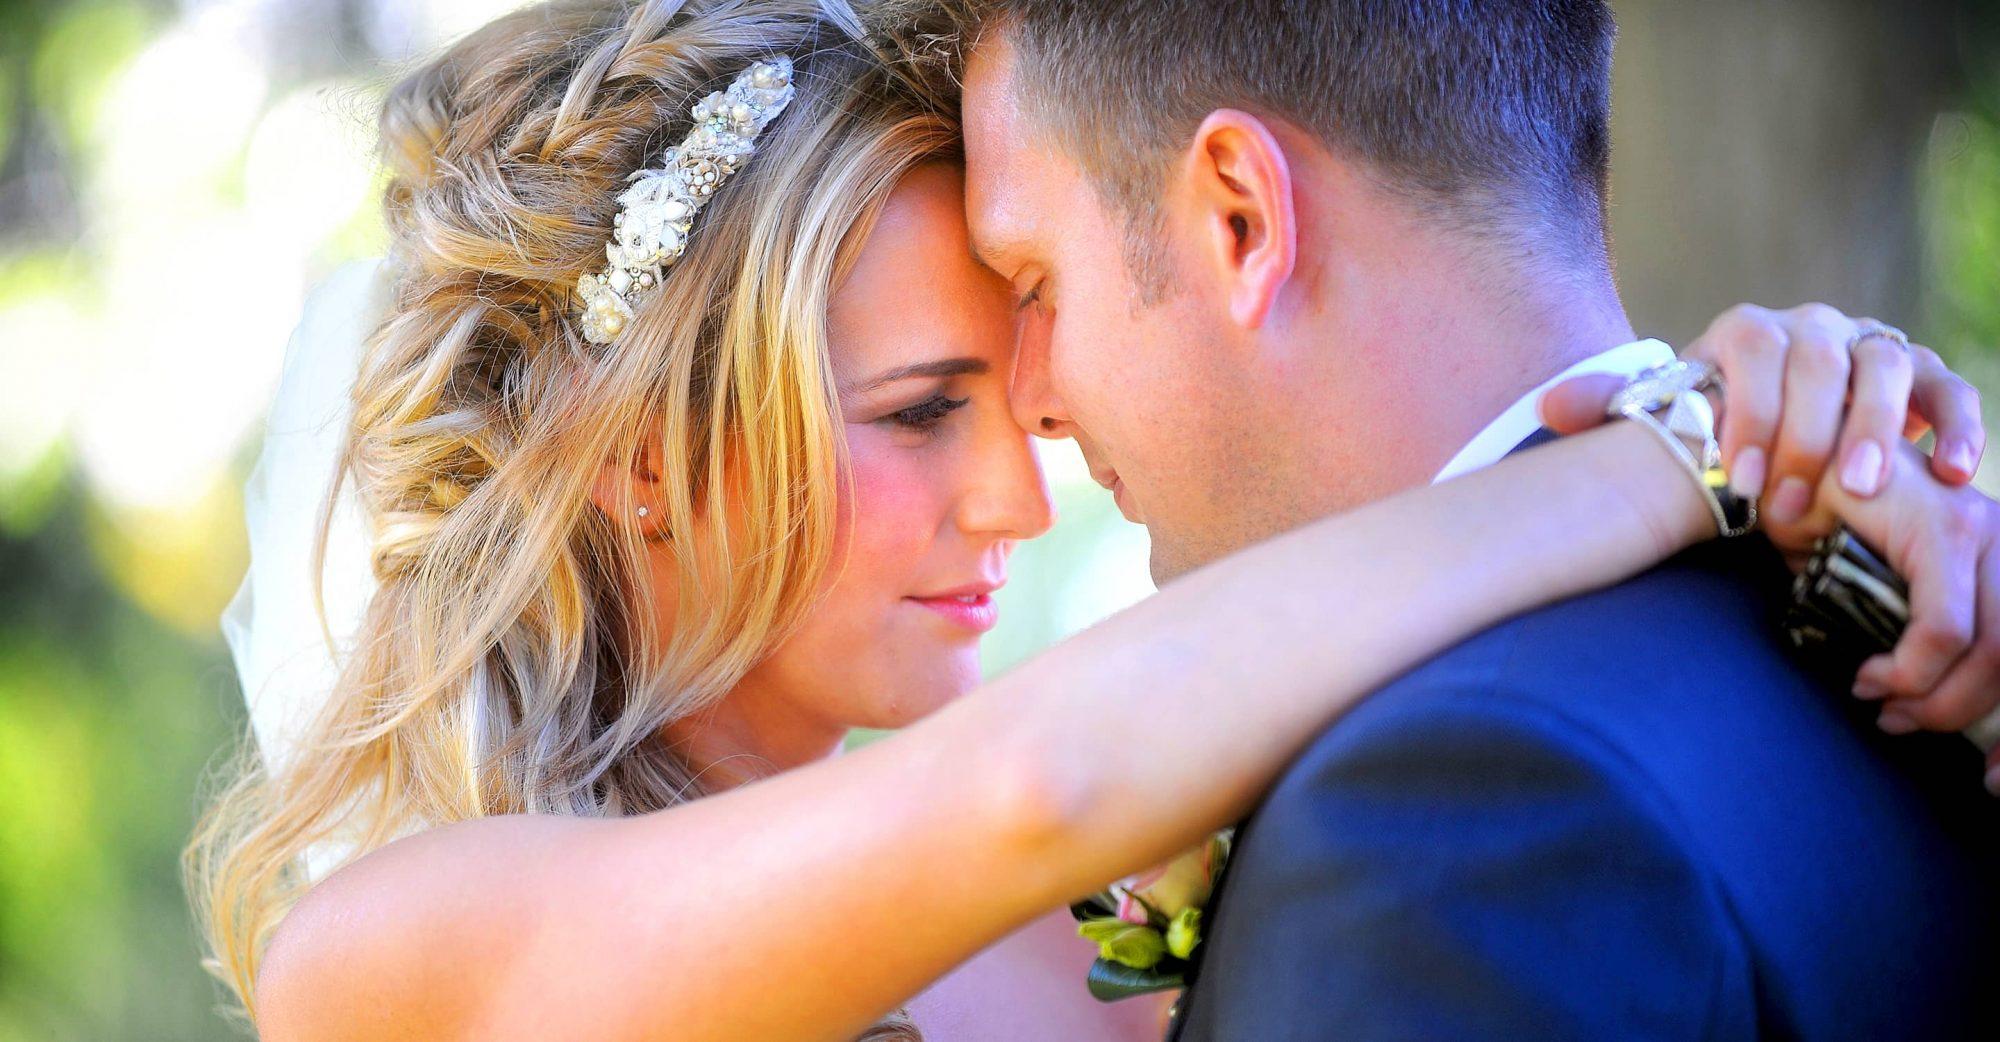 Essex based wedding photographer - Married couple